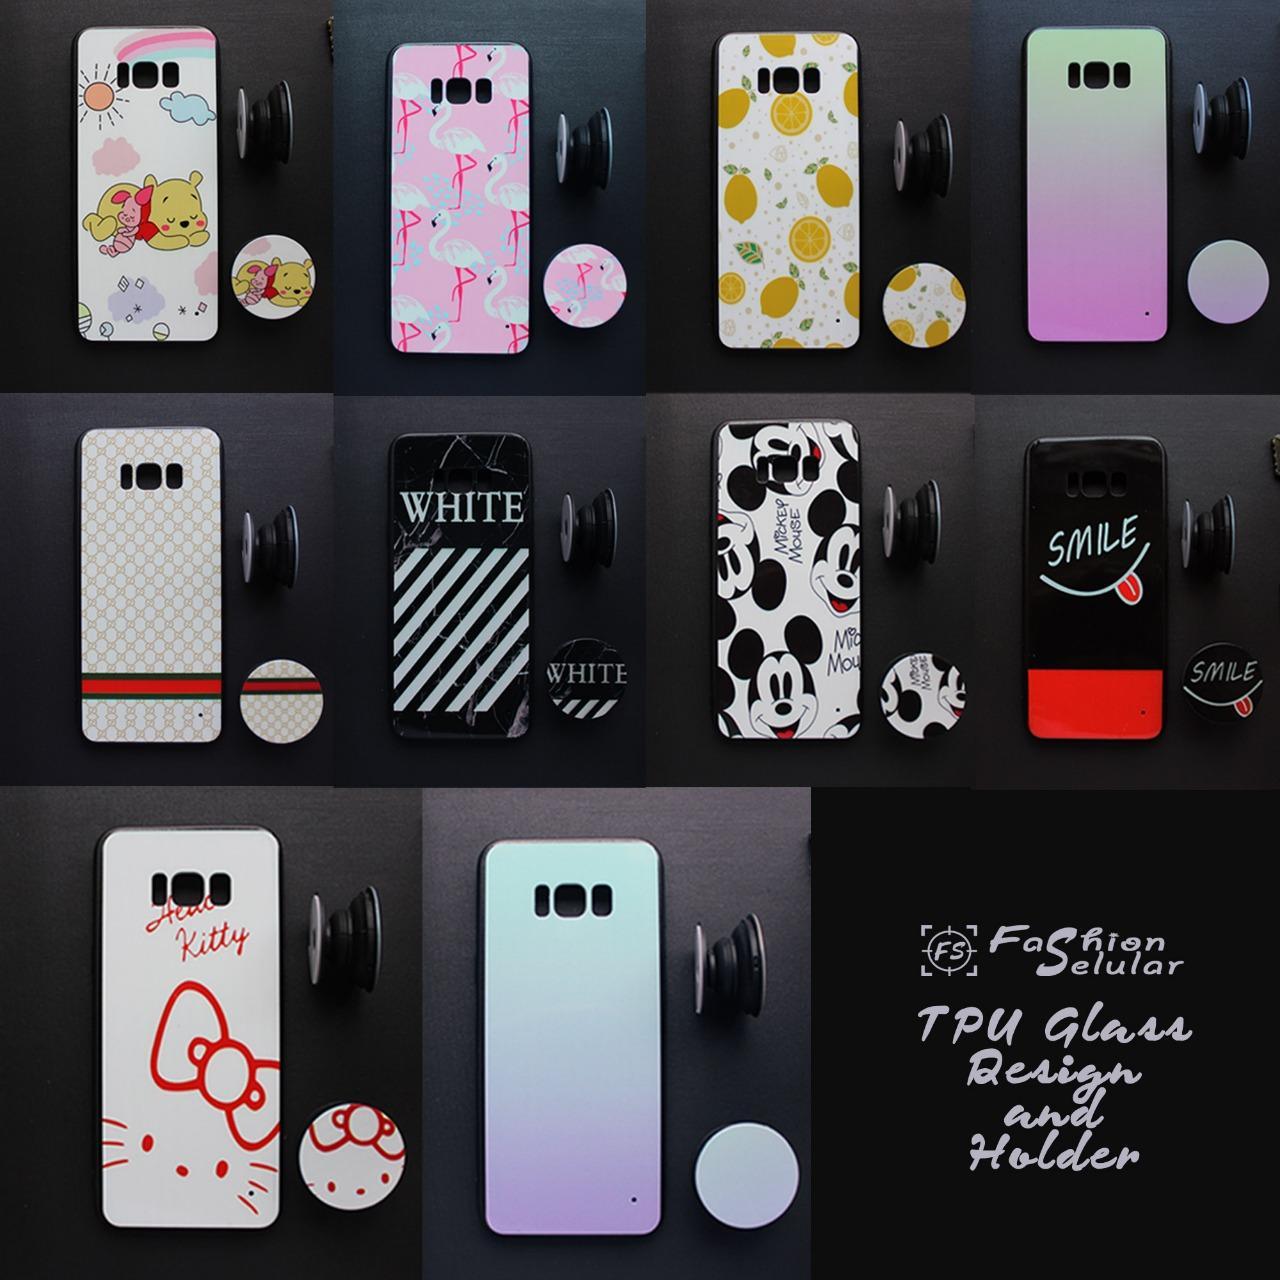 Casing Samsung Galaxy J1 Ace Case Fuze GLass Design + Pop Socket - IMS - Random